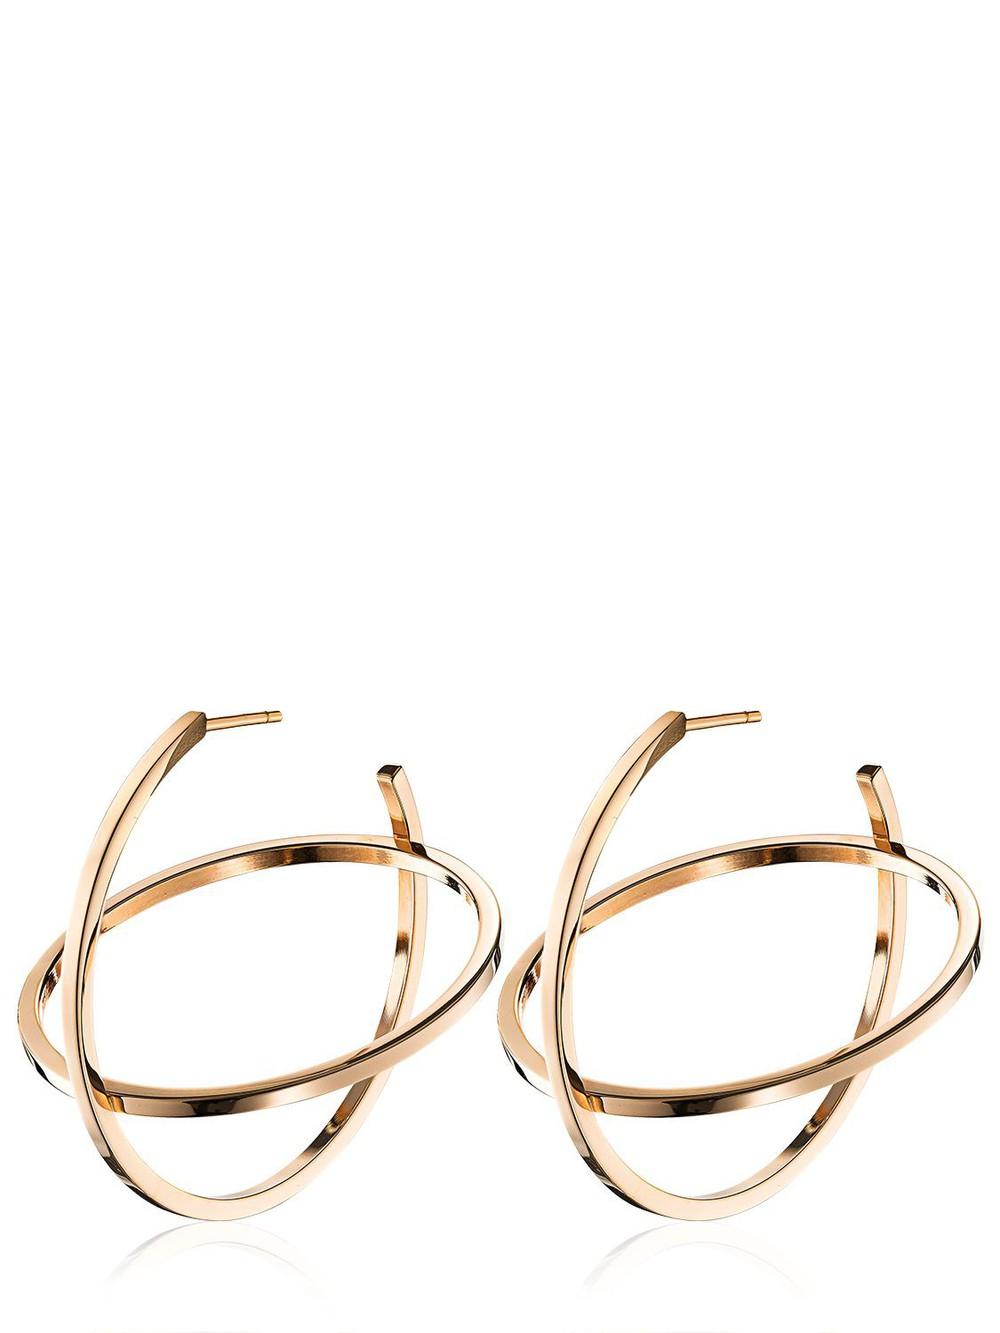 VITA FEDE Atlas Earrings in gold / rose